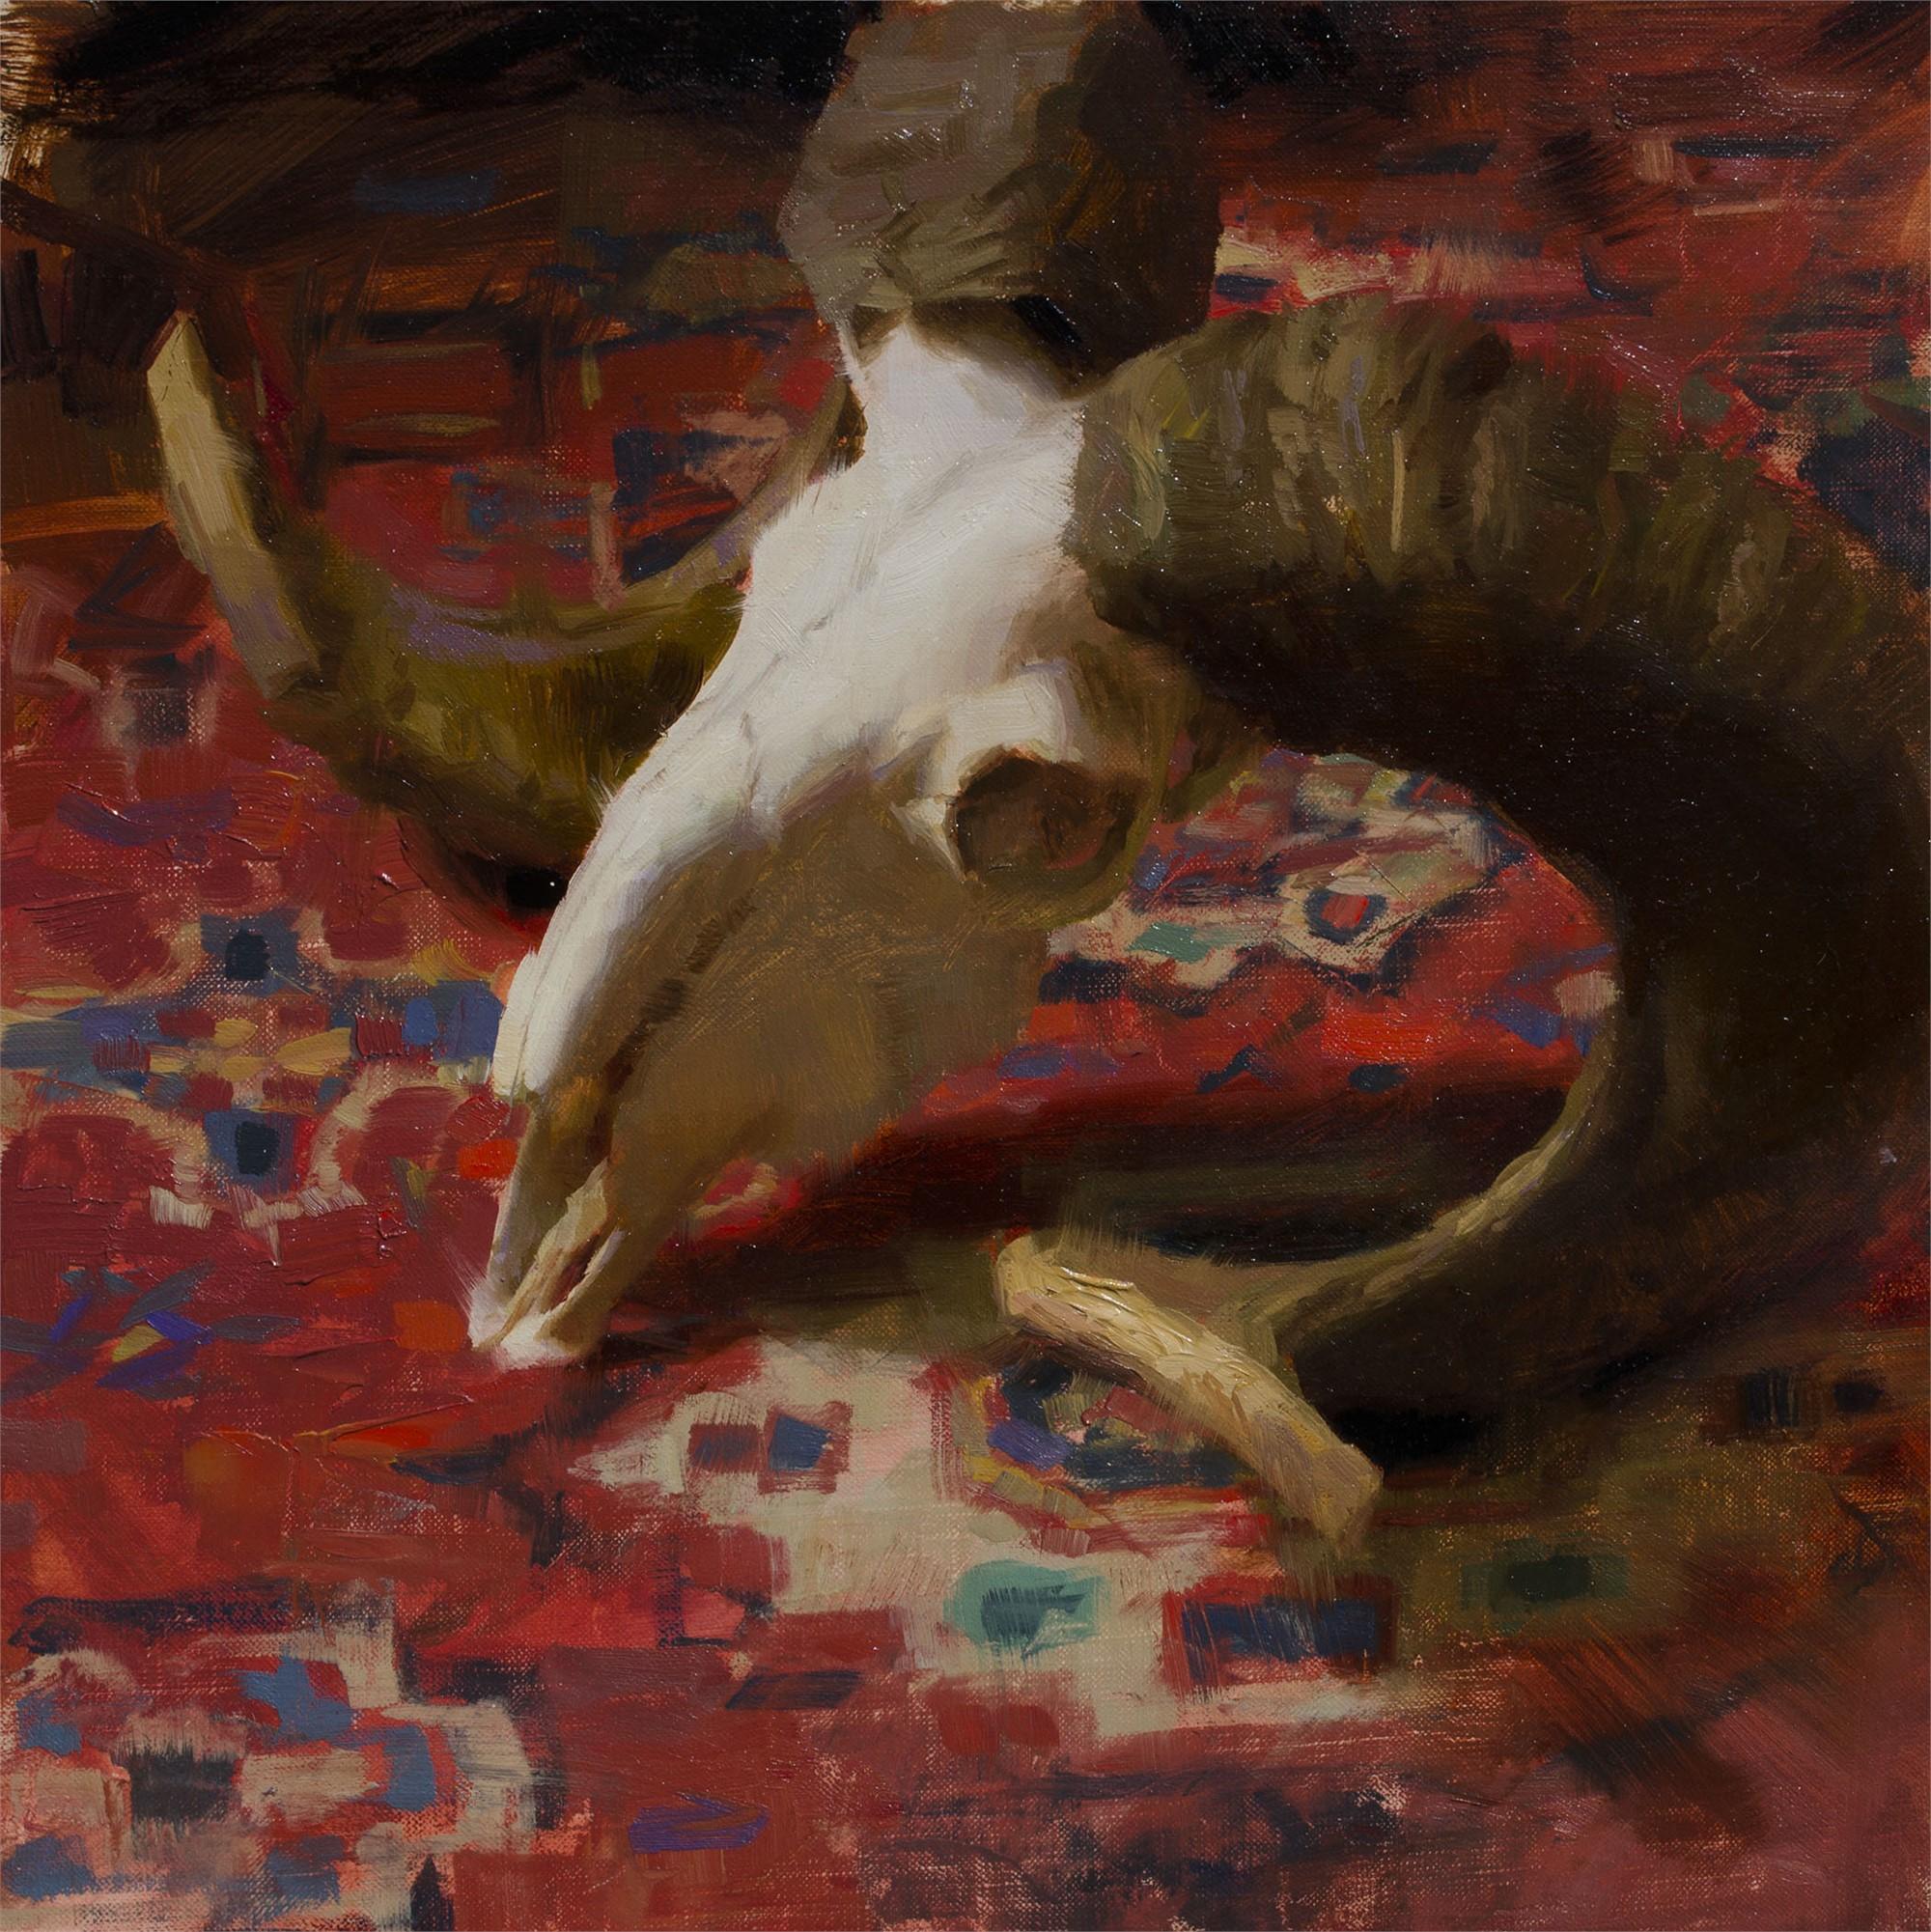 Ram's Skull by Daniel Keys